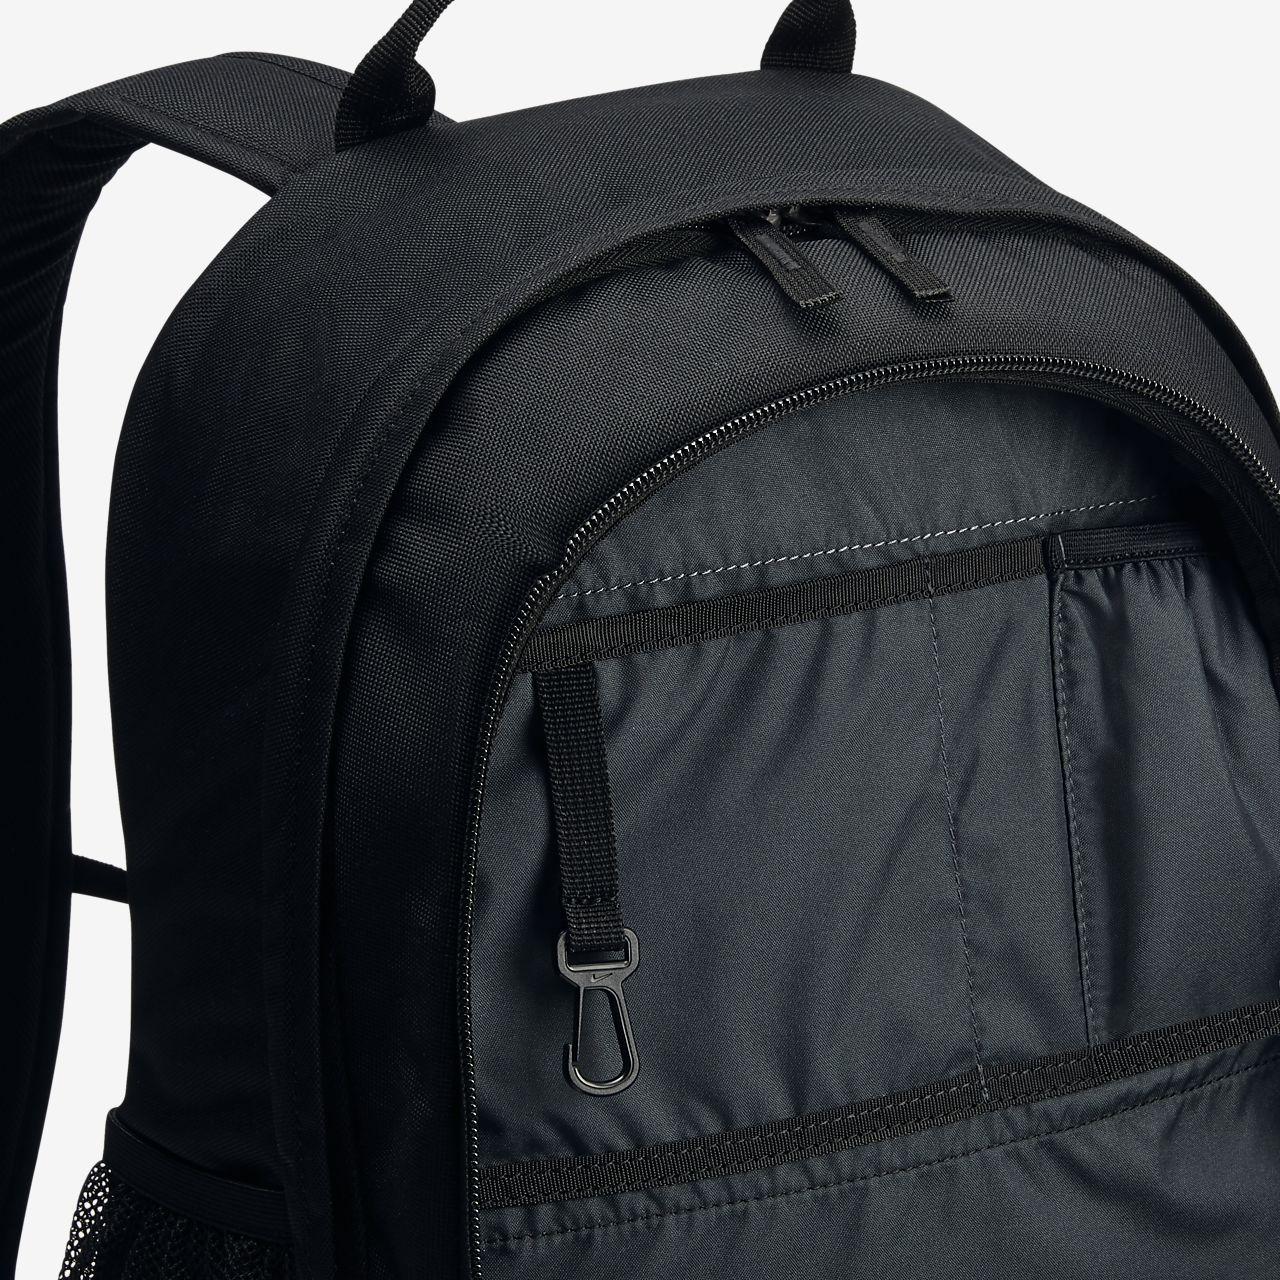 98e4809e1f Nike Sportswear Hayward Futura 2.0 Backpack. Nike.com NL